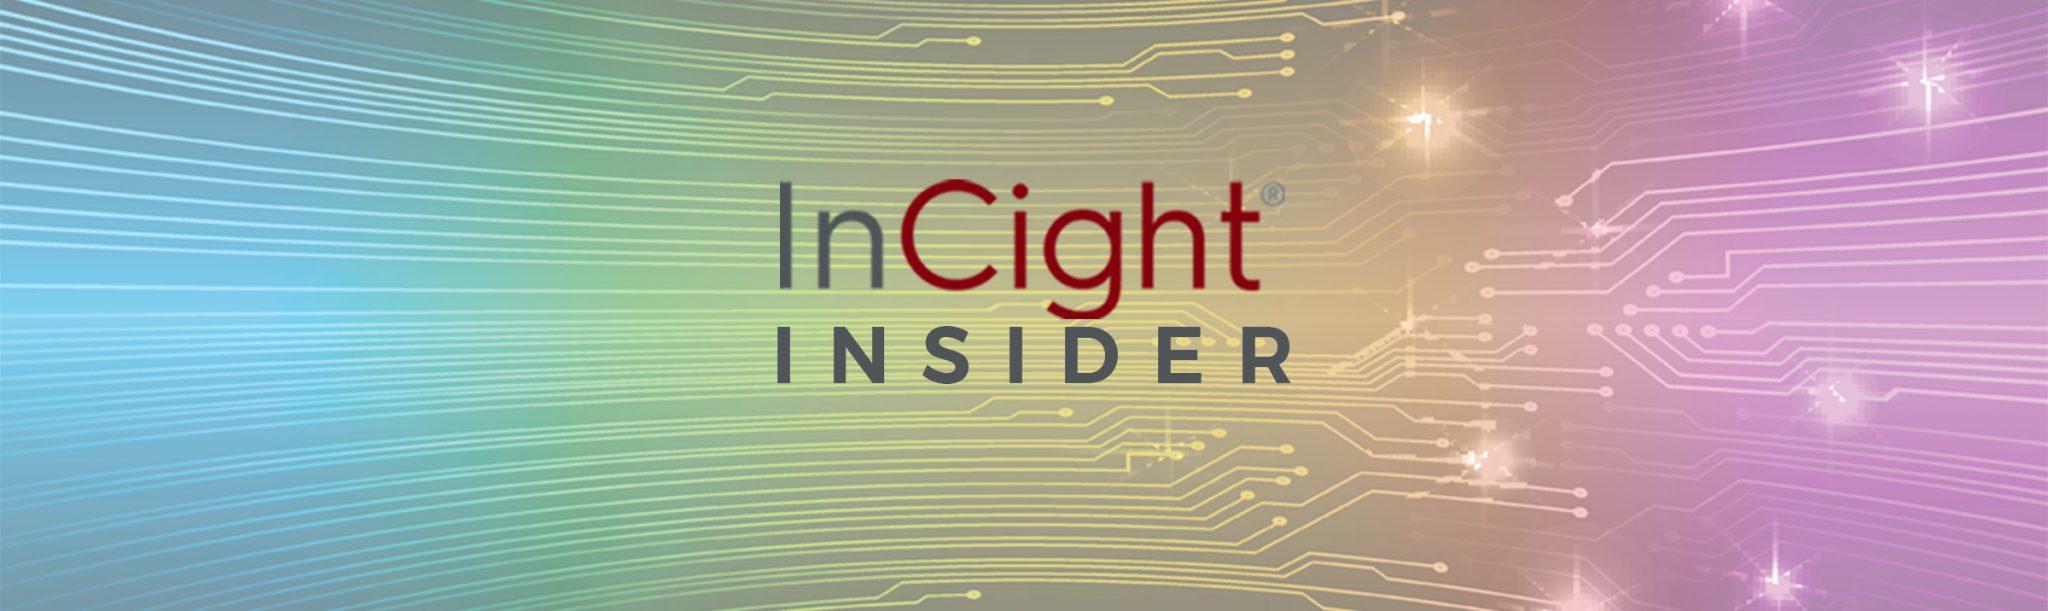 InCight Insider Banner